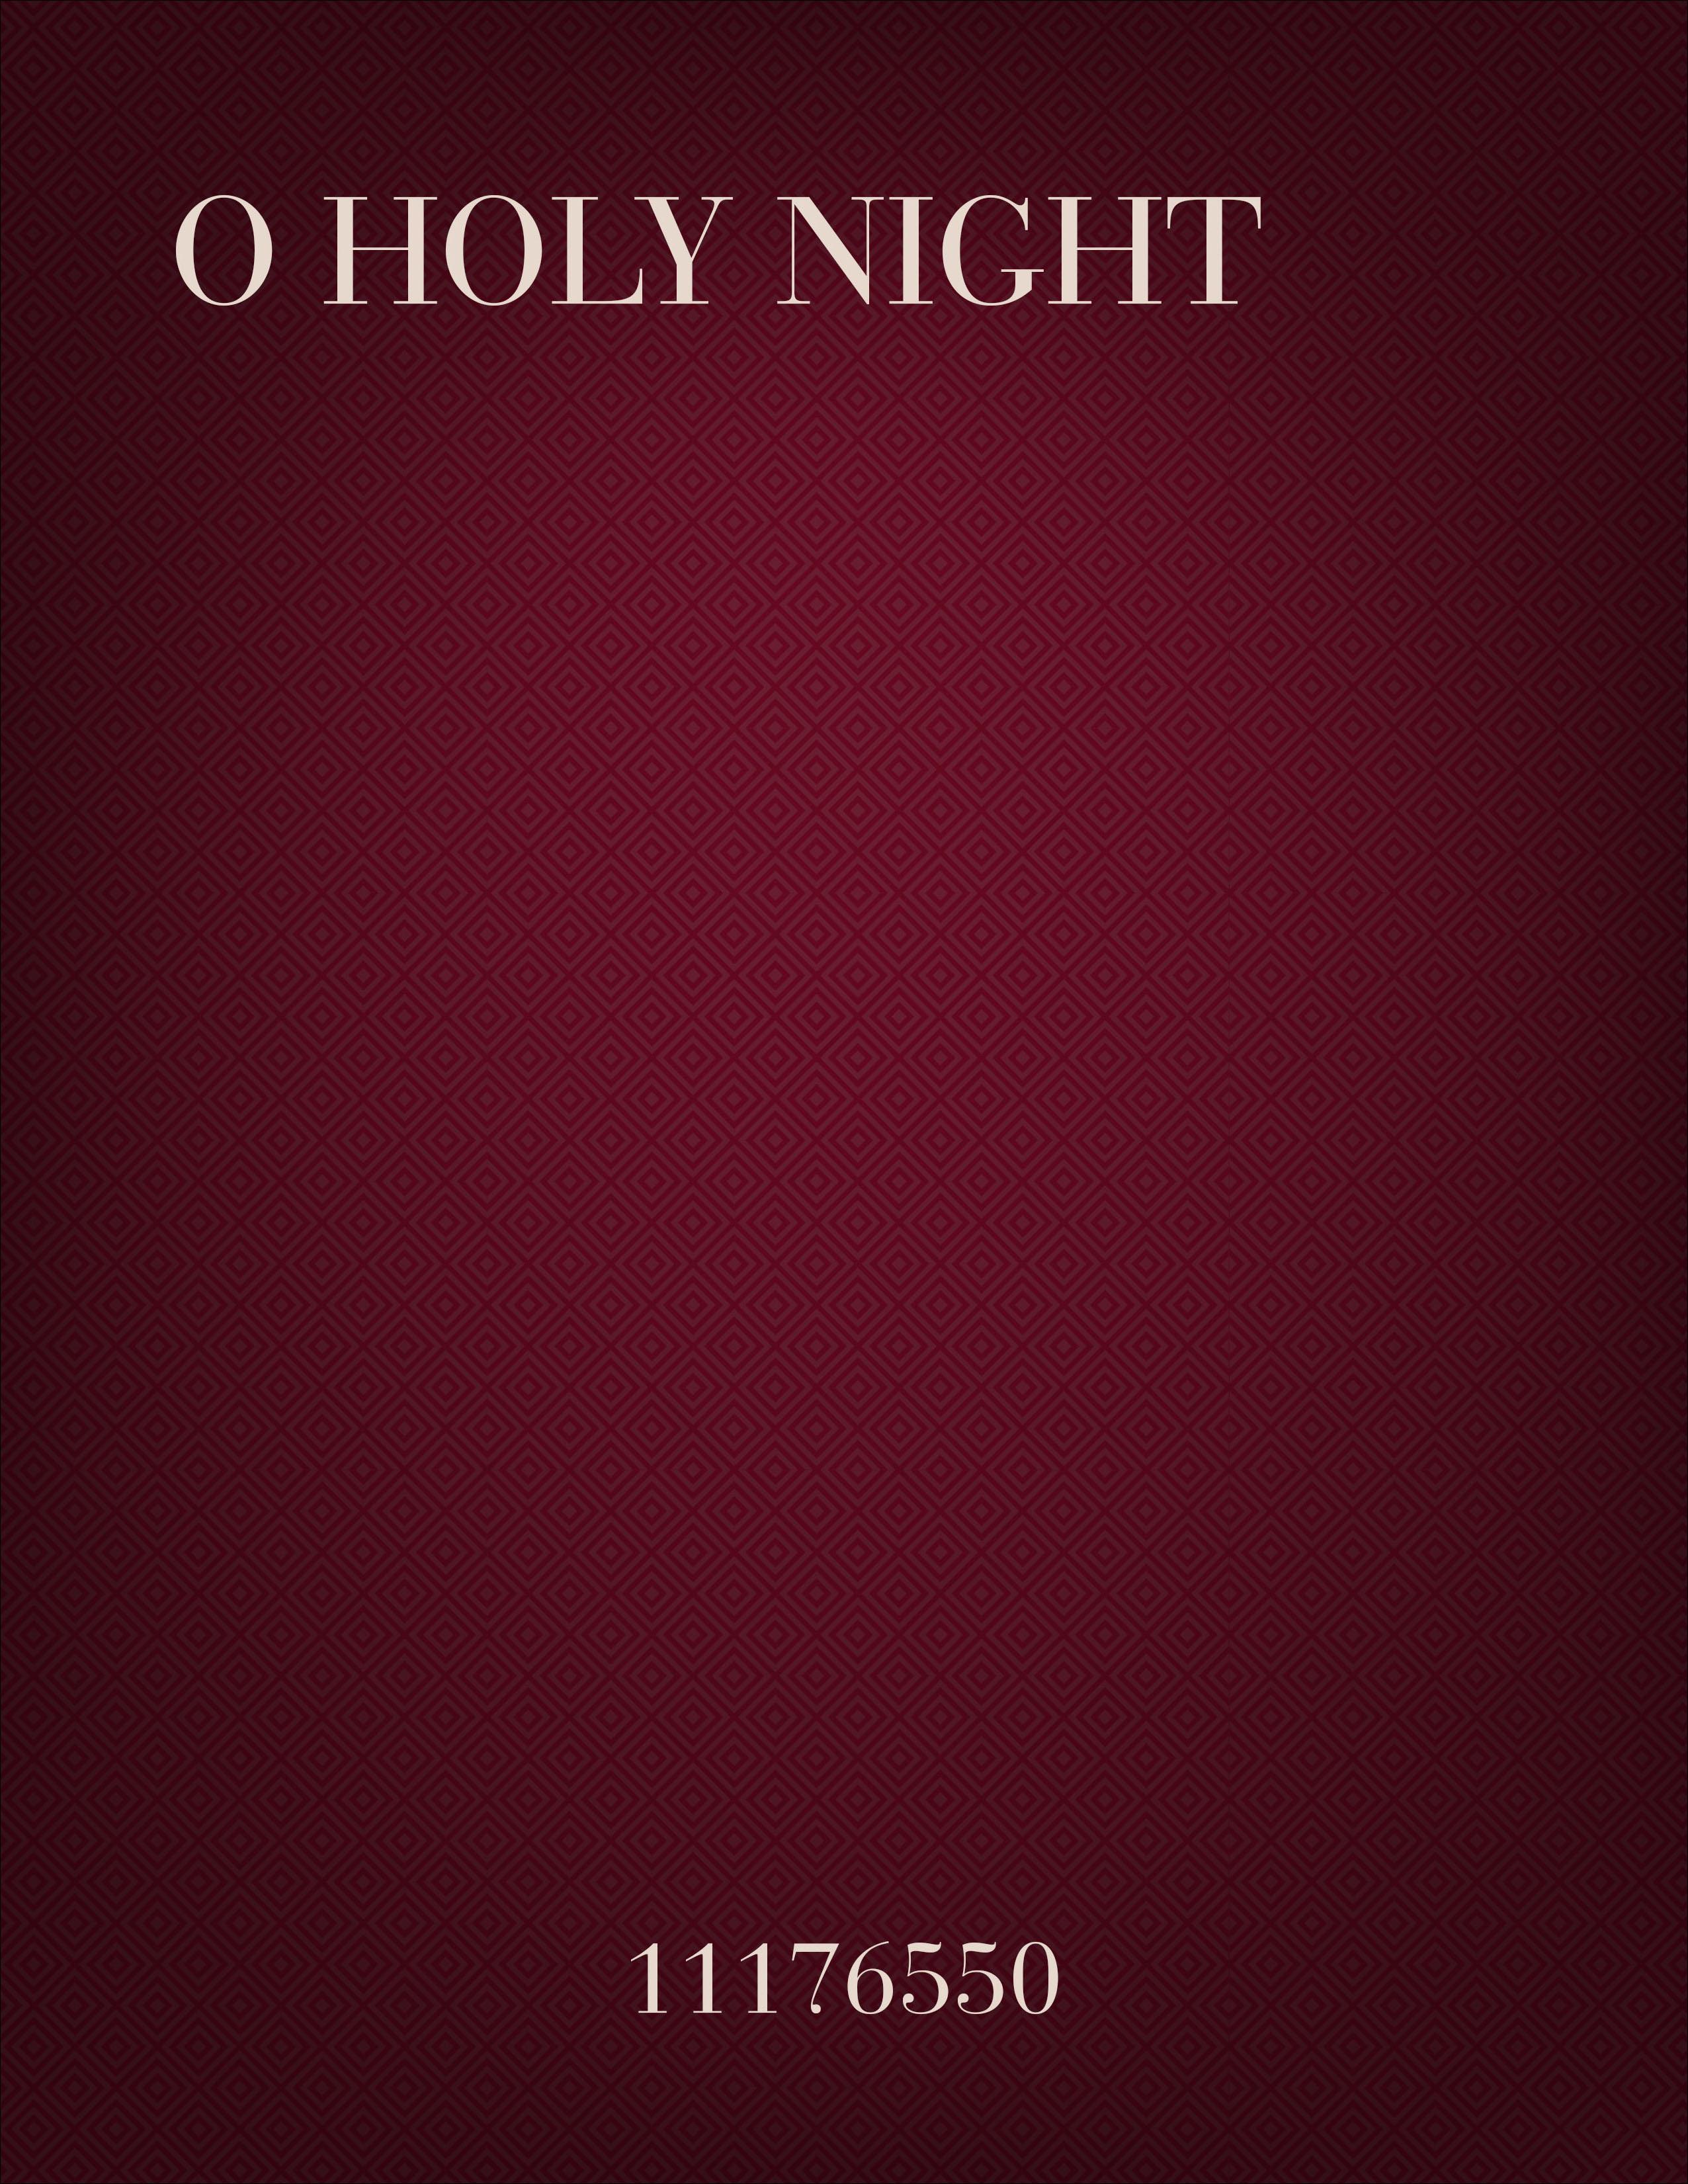 O Holy Night.